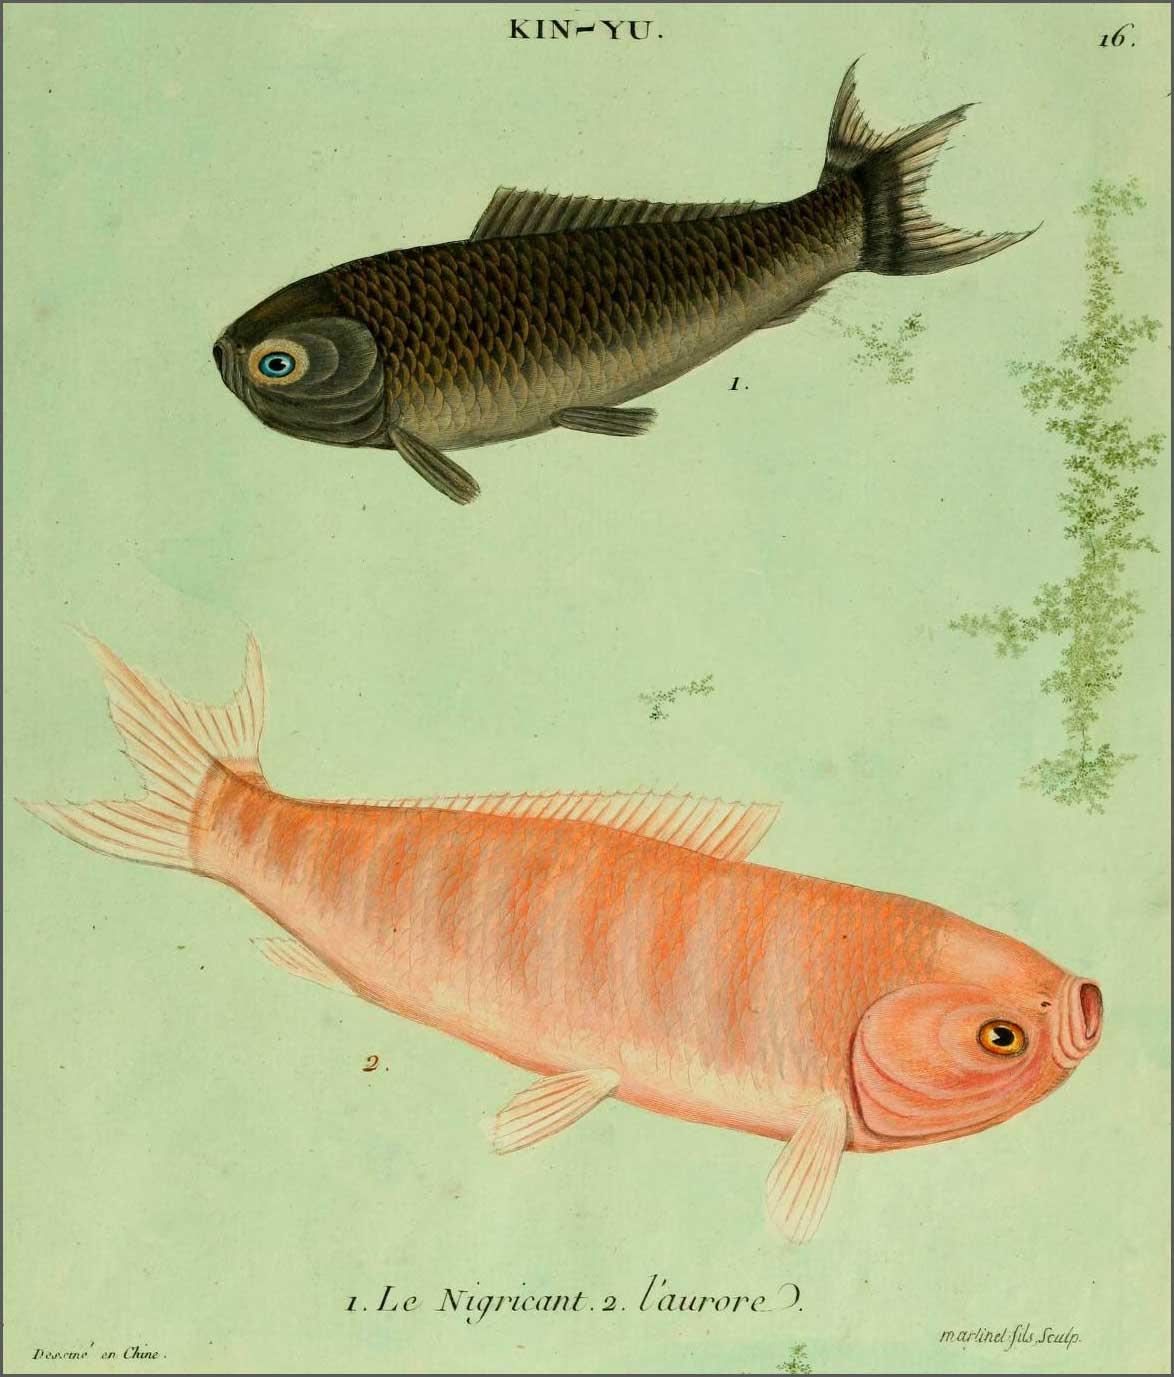 Dorade de la Chine les début de l'aquariophilie